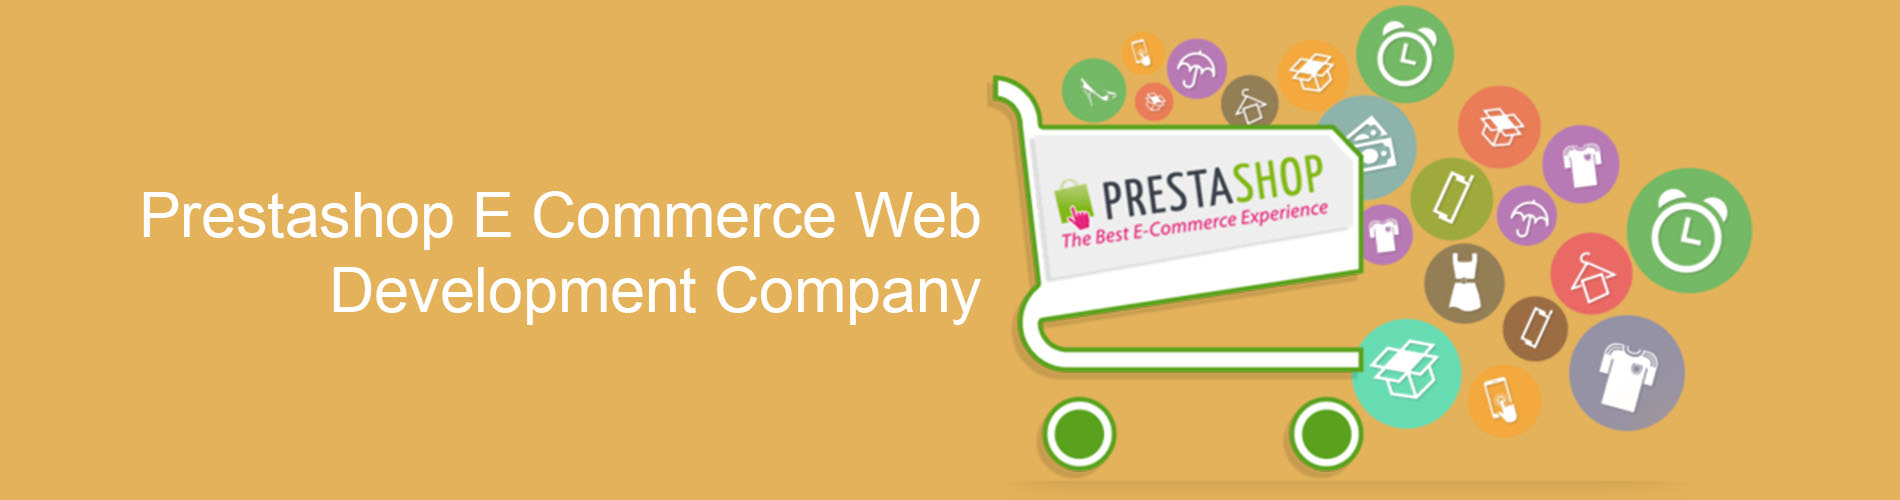 prestashop-e-commerce-web-development-company